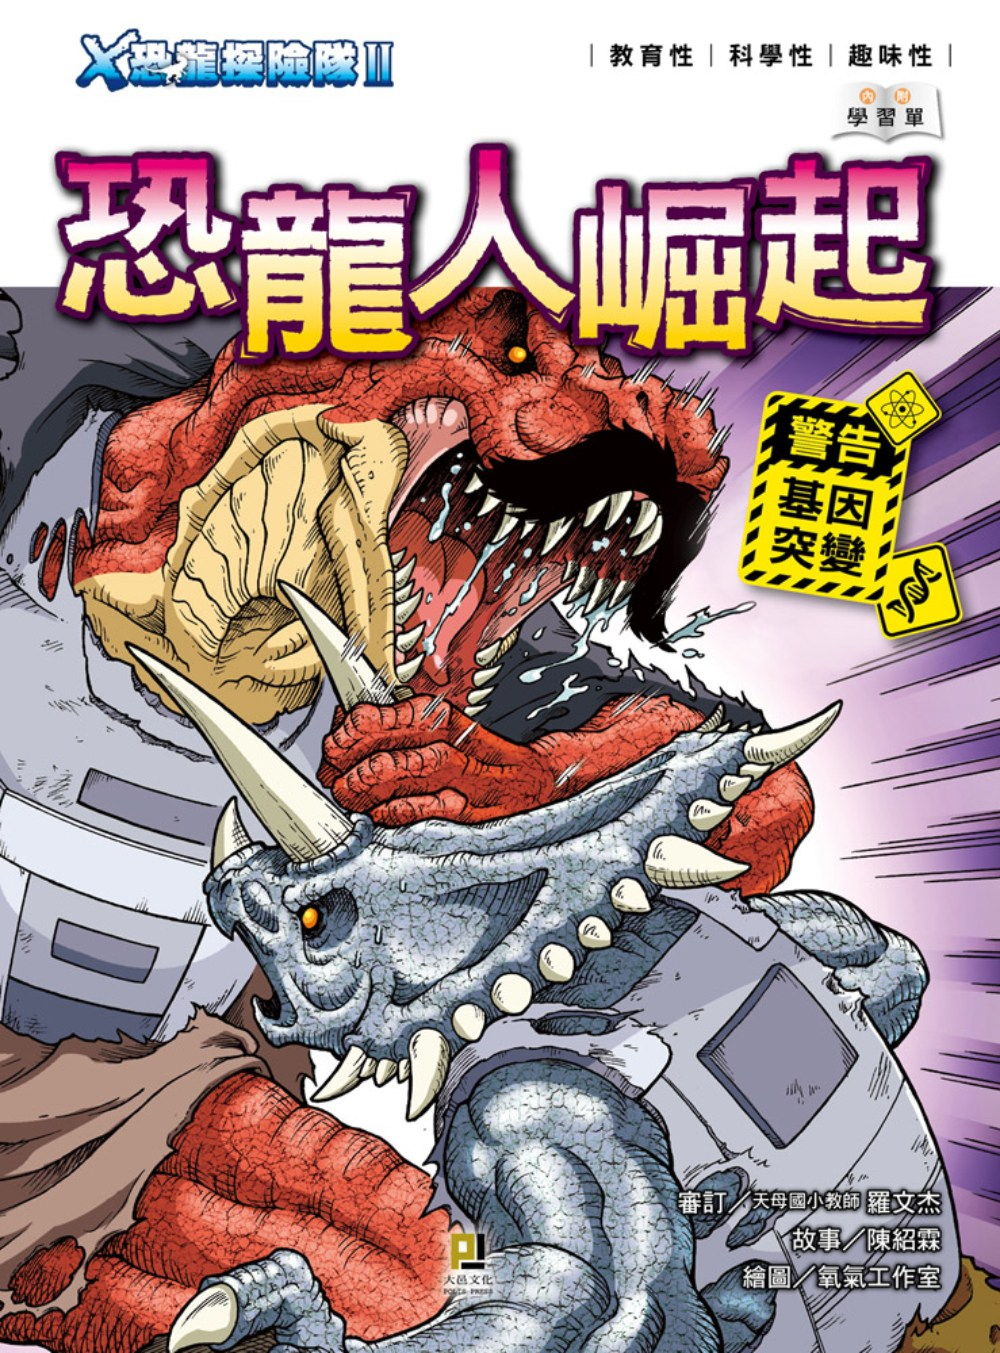 X恐龍探險隊Ⅱ恐龍人崛起封面圖